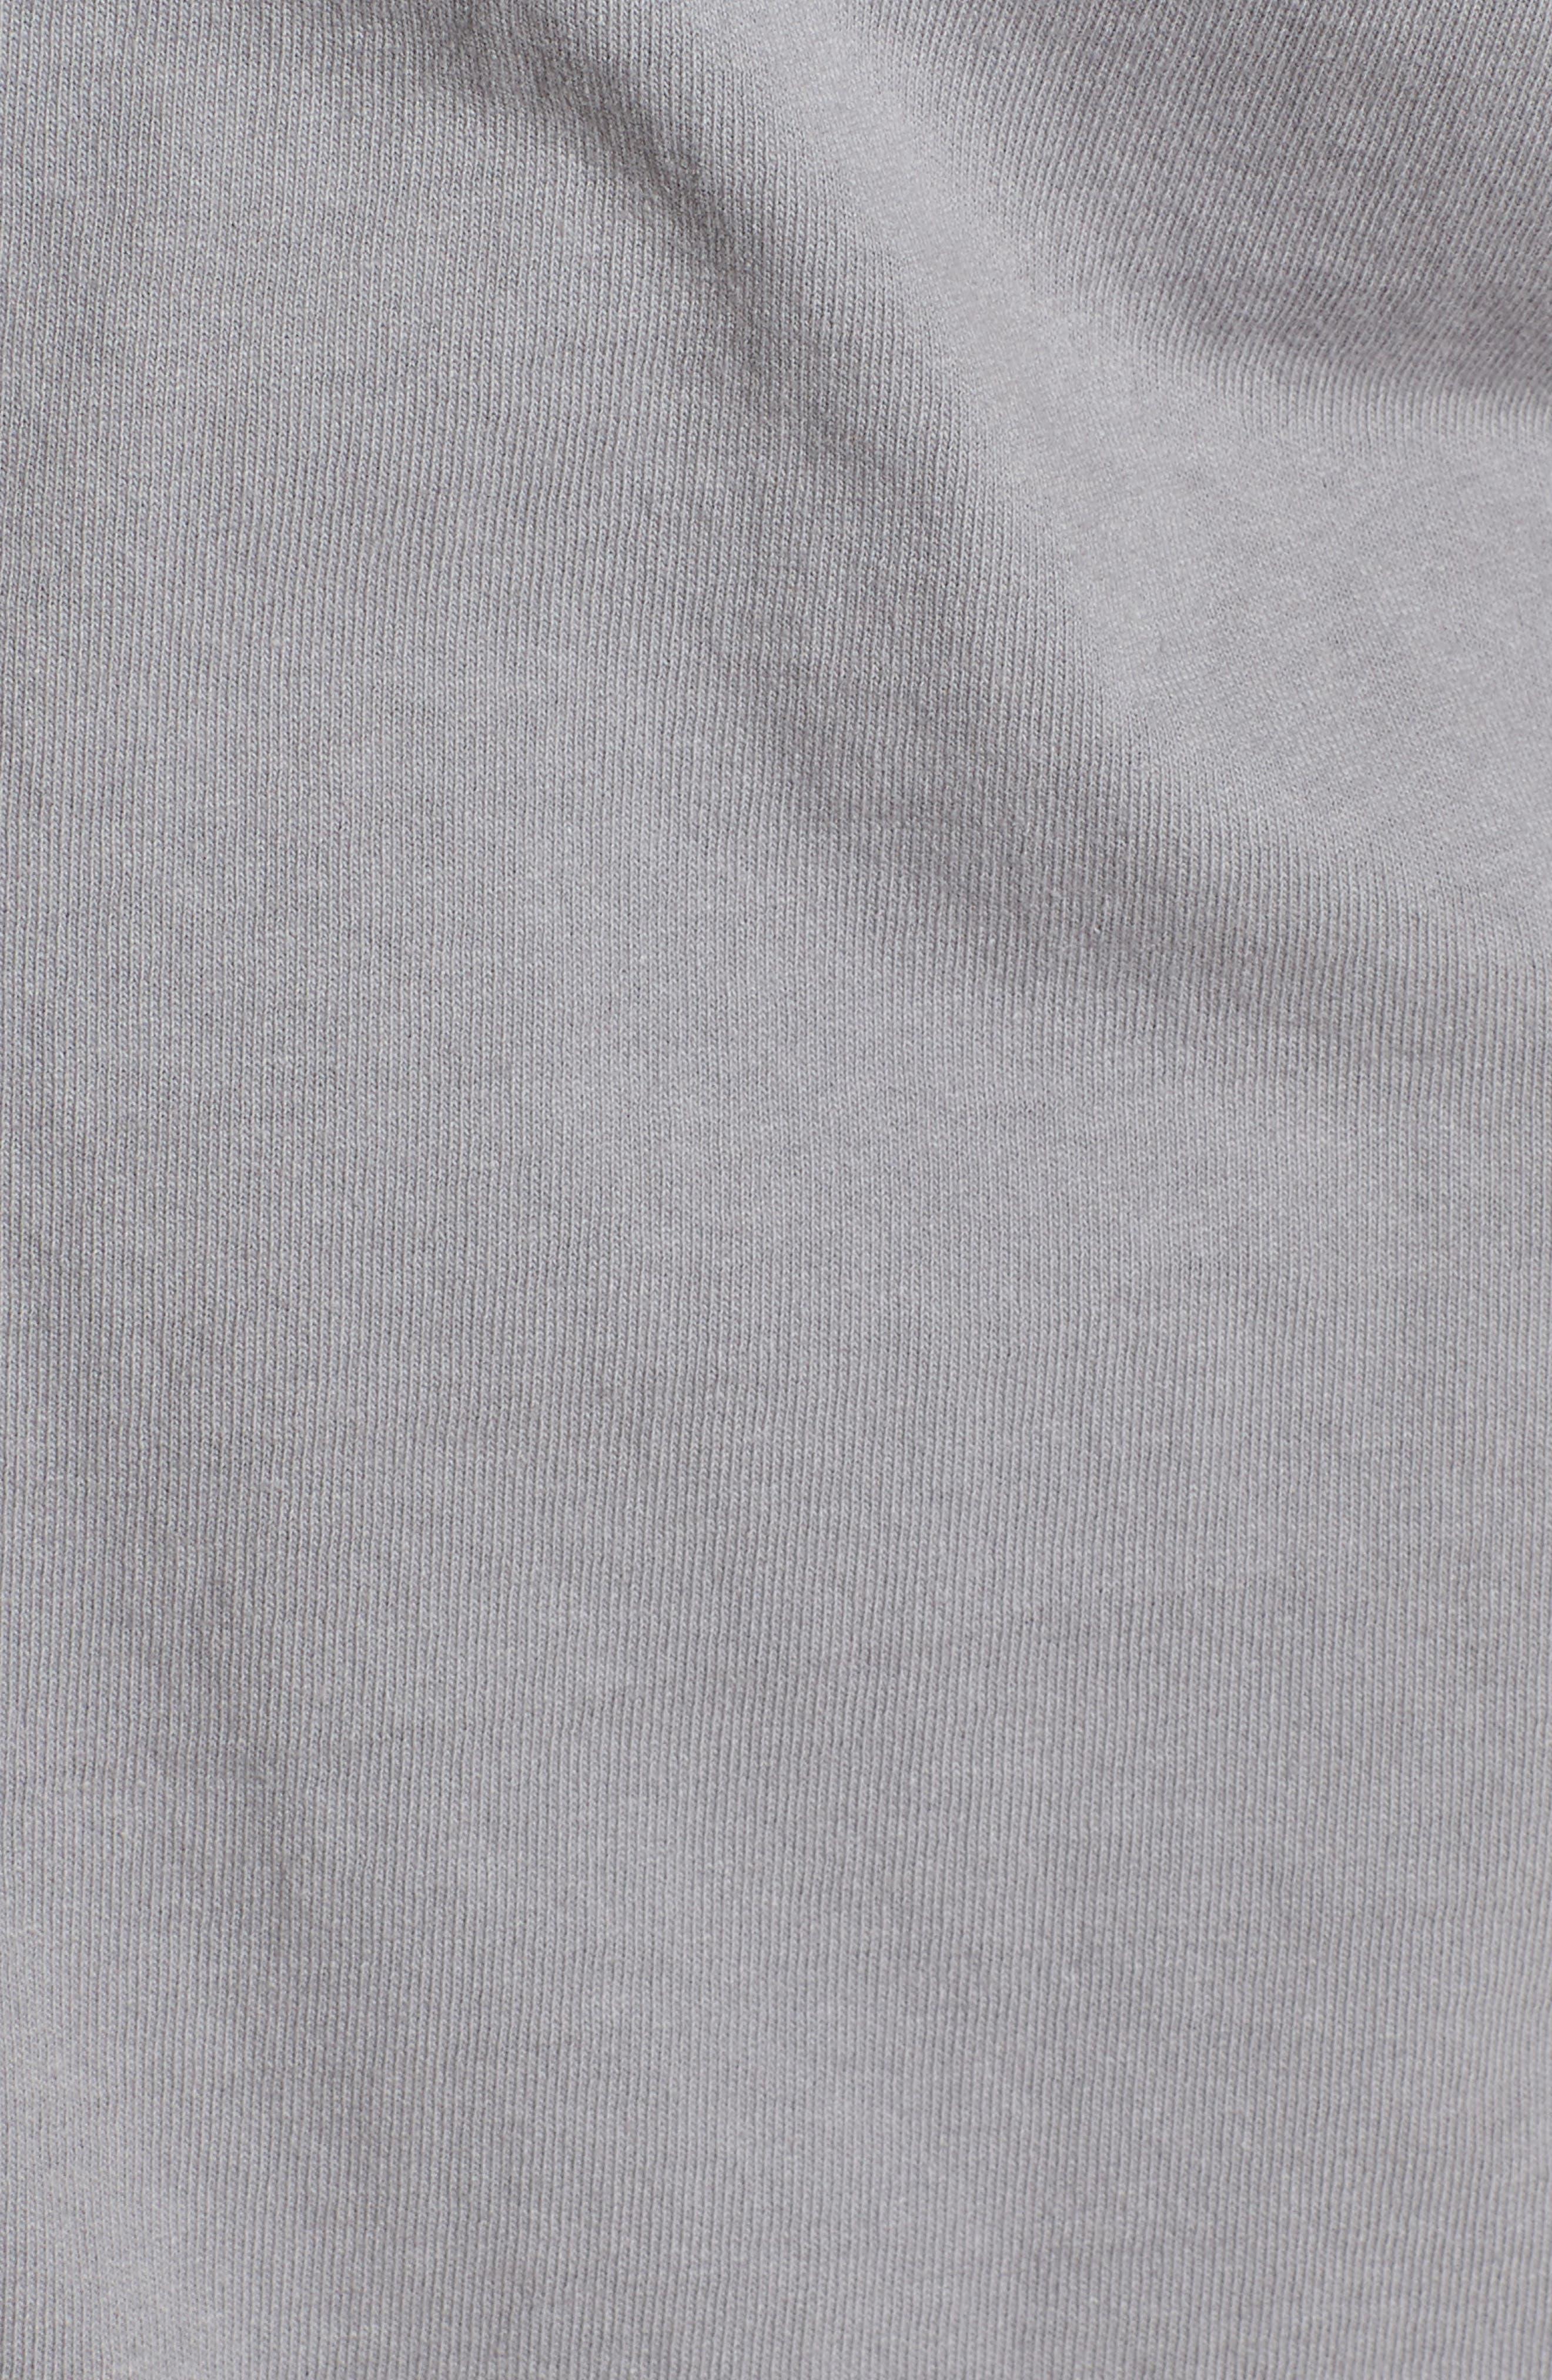 Tee Lab Knit Button Down Shirt,                             Alternate thumbnail 5, color,                             Shadow